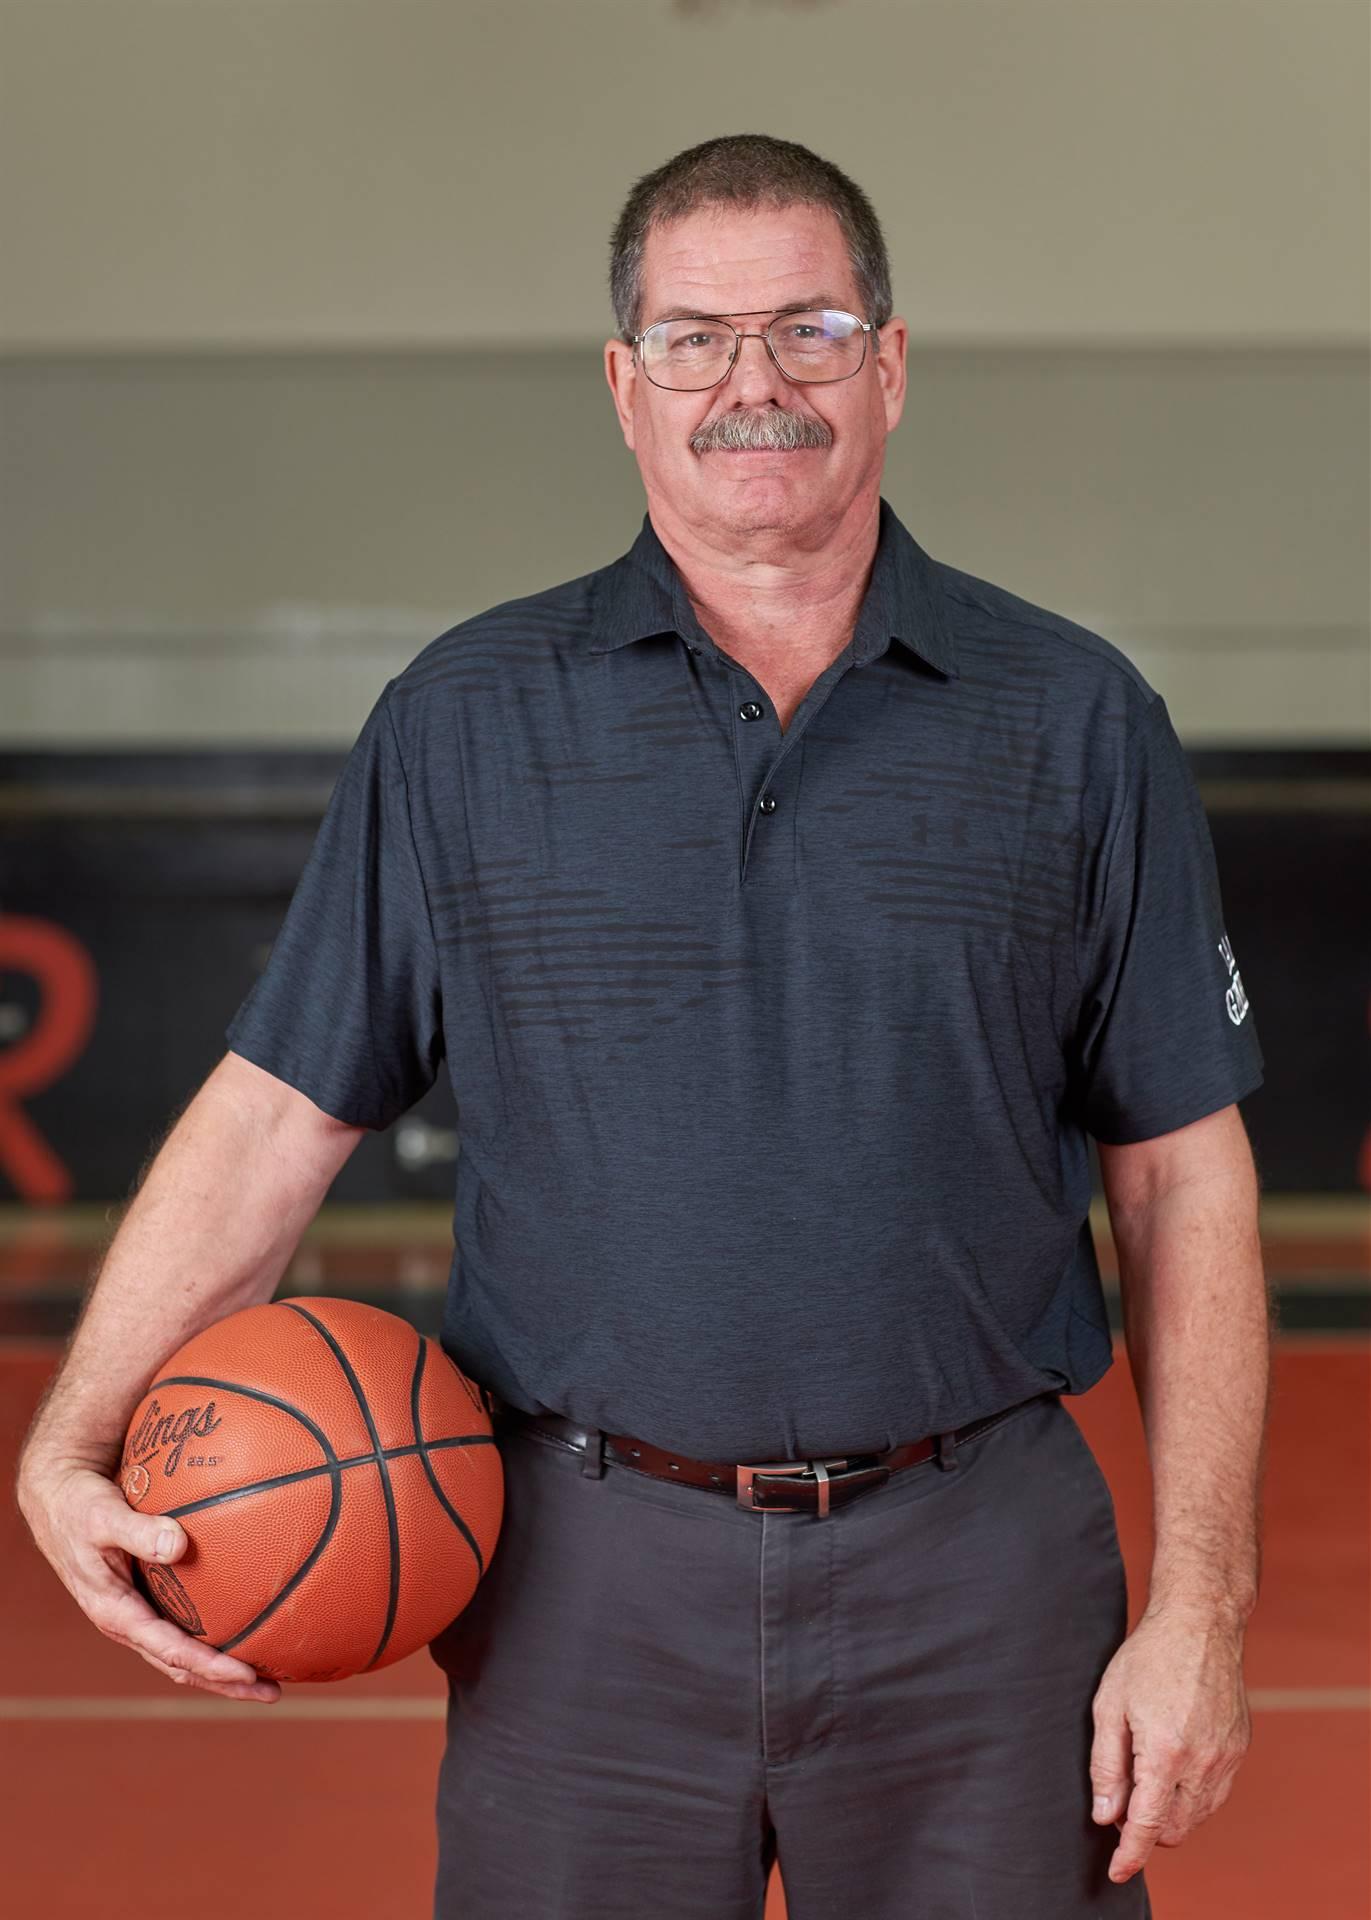 8th Girls Basketball Coach - Denny Varian